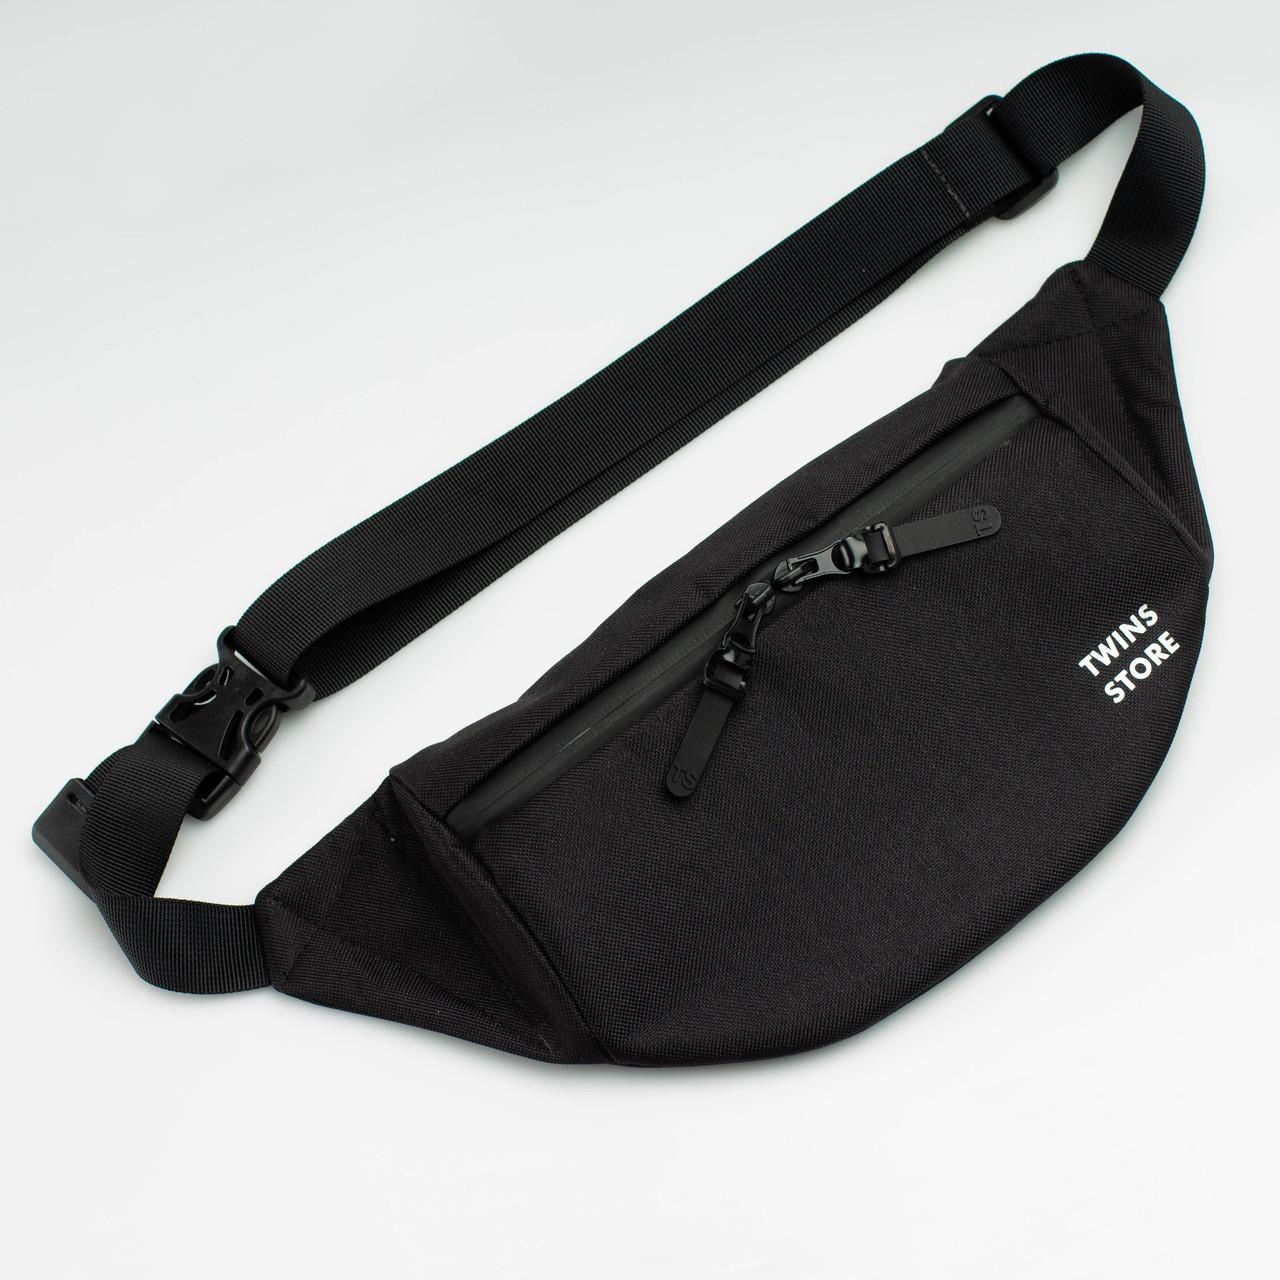 Поясная сумка Twins Large черная